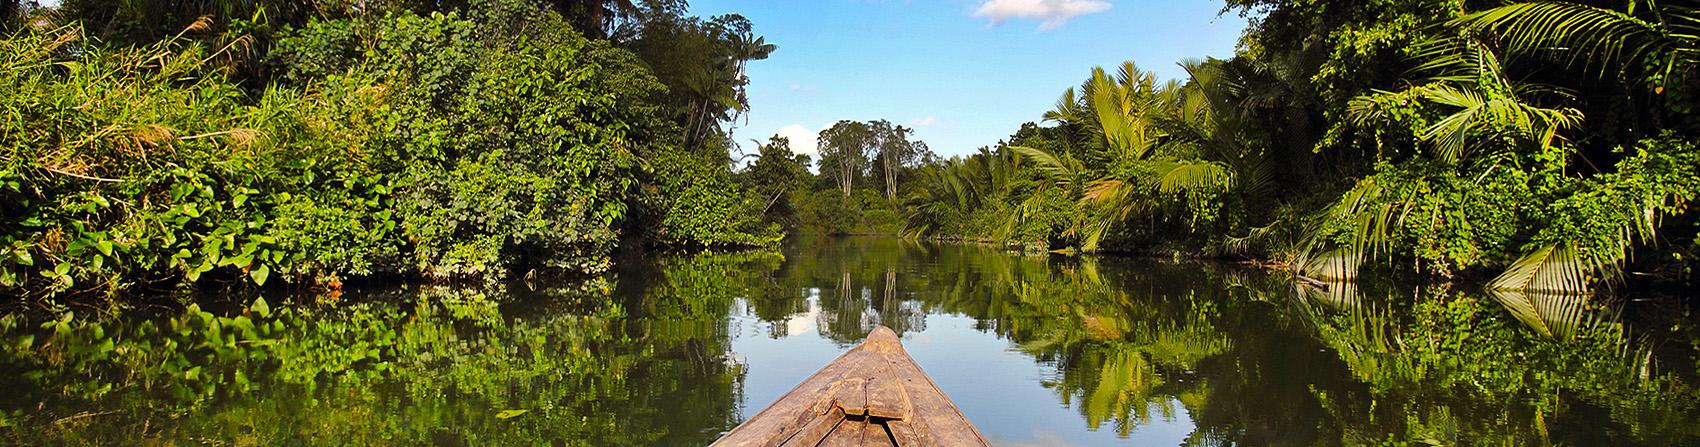 Boat trip on La'fau River to the interior of Nias Island. North Nias (Nias Utara), Indonesia.